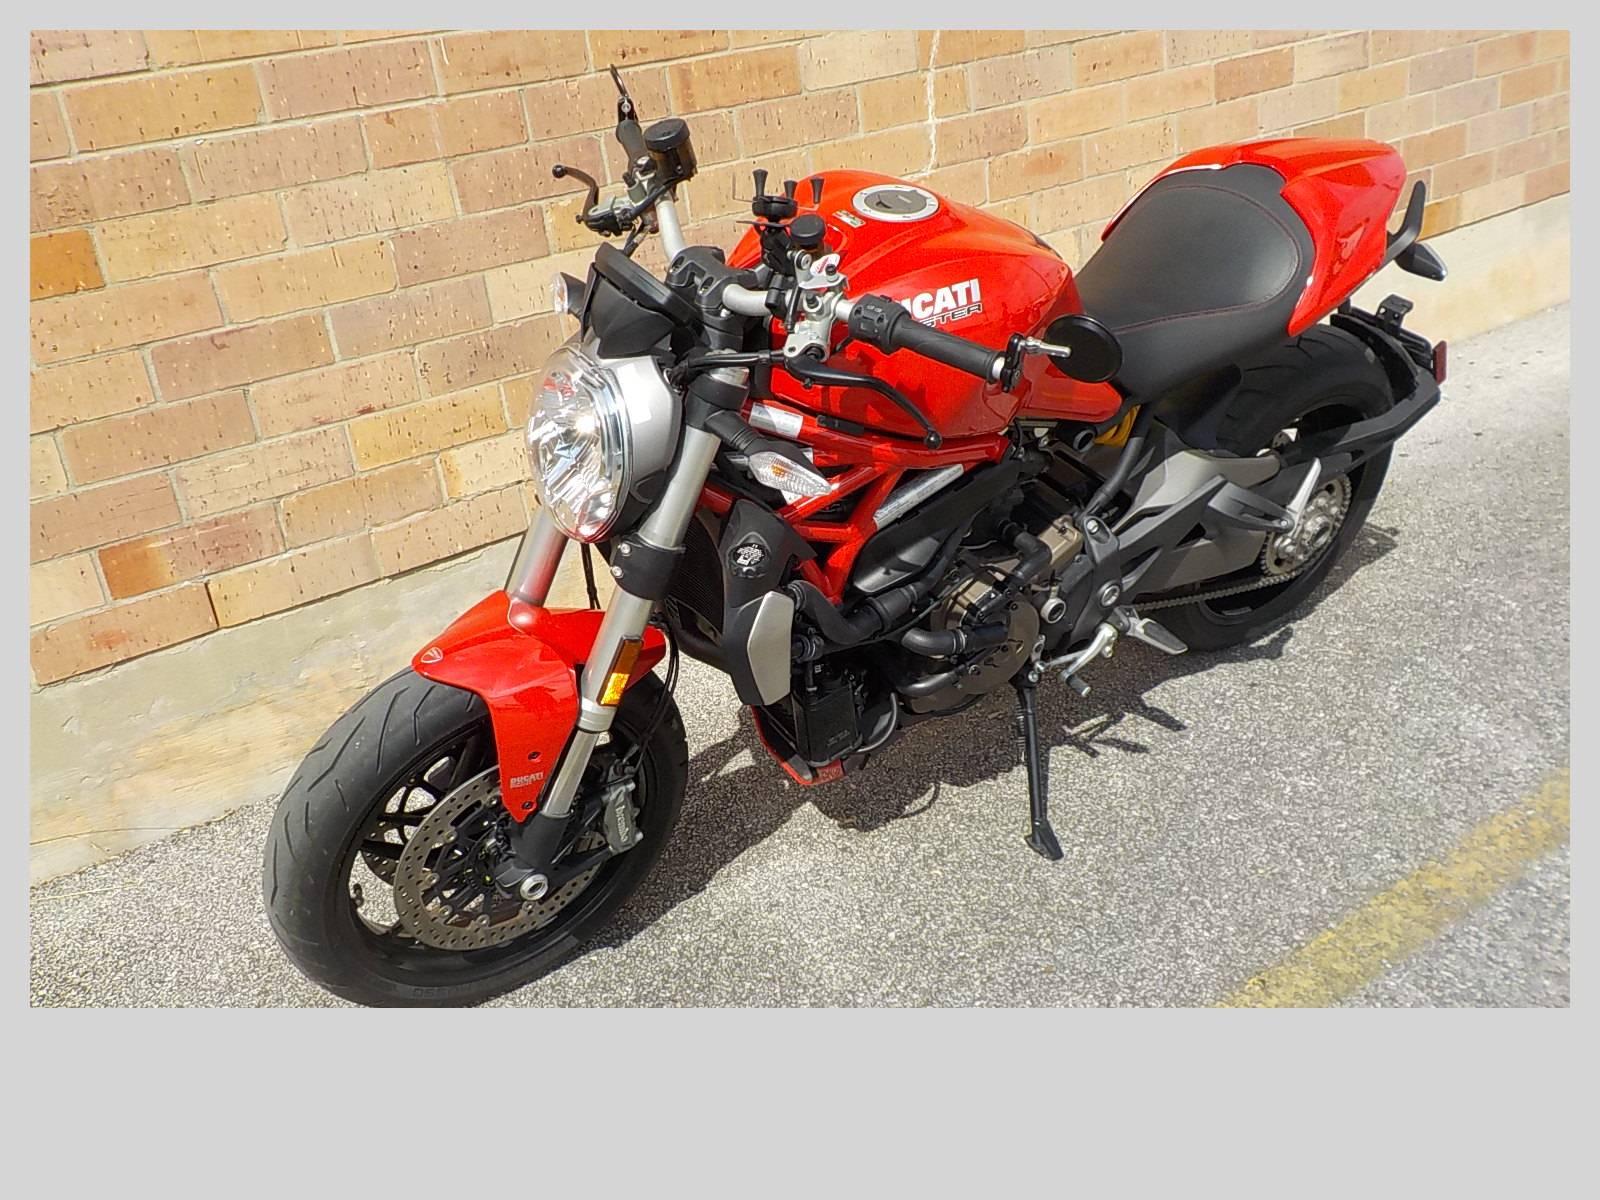 2016 Ducati Monster 1200 S in San Antonio, Texas